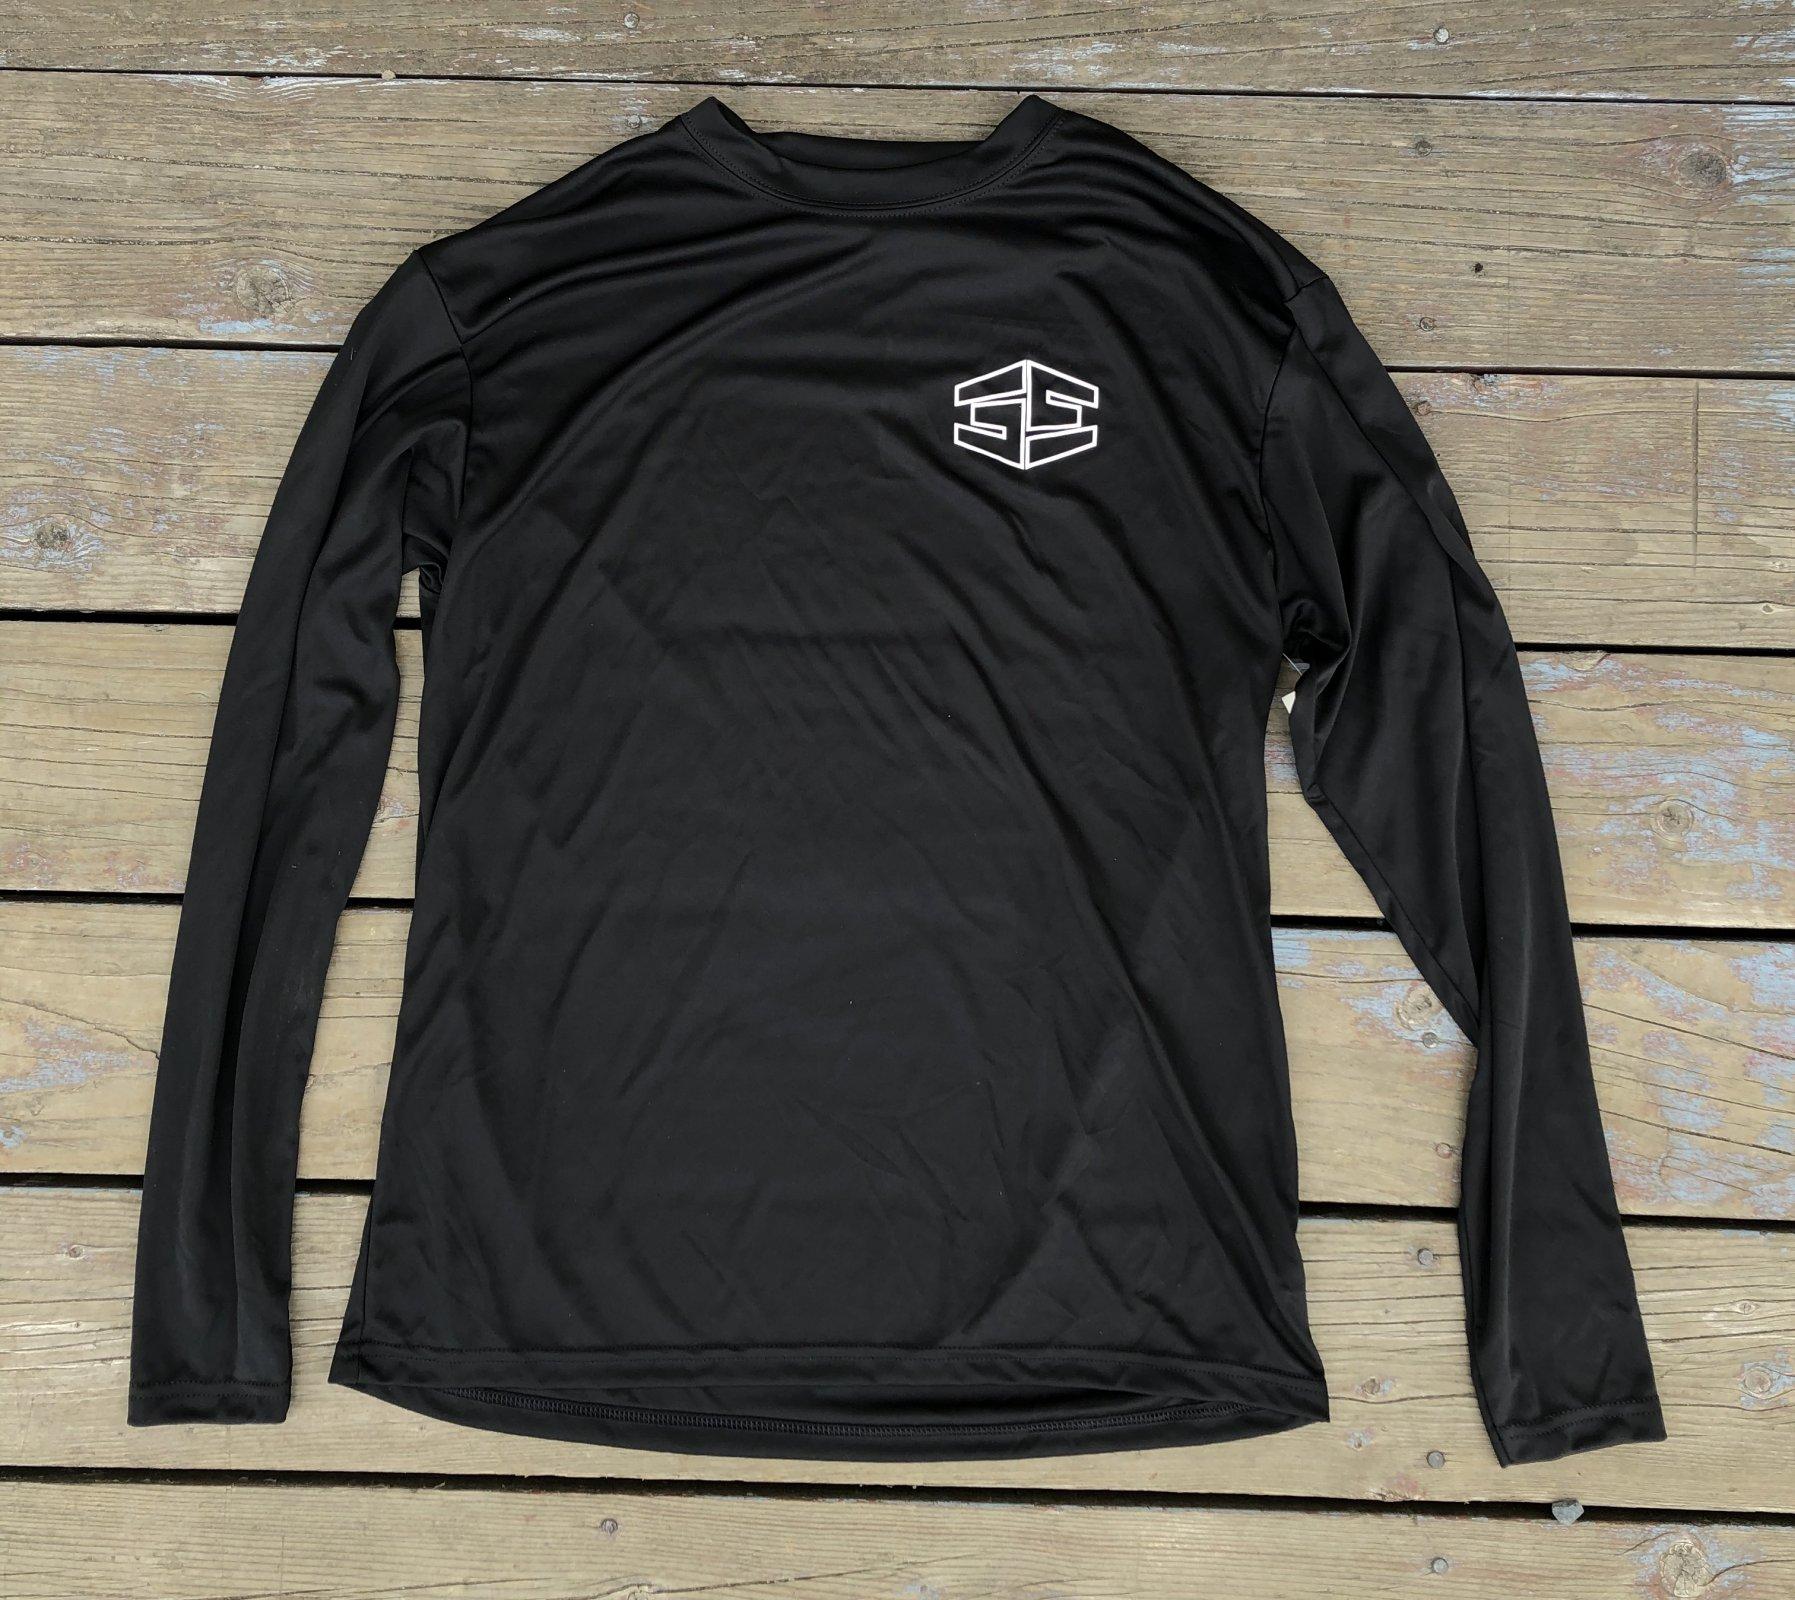 35th Tron First Layer Long Sleeve Shirt Black